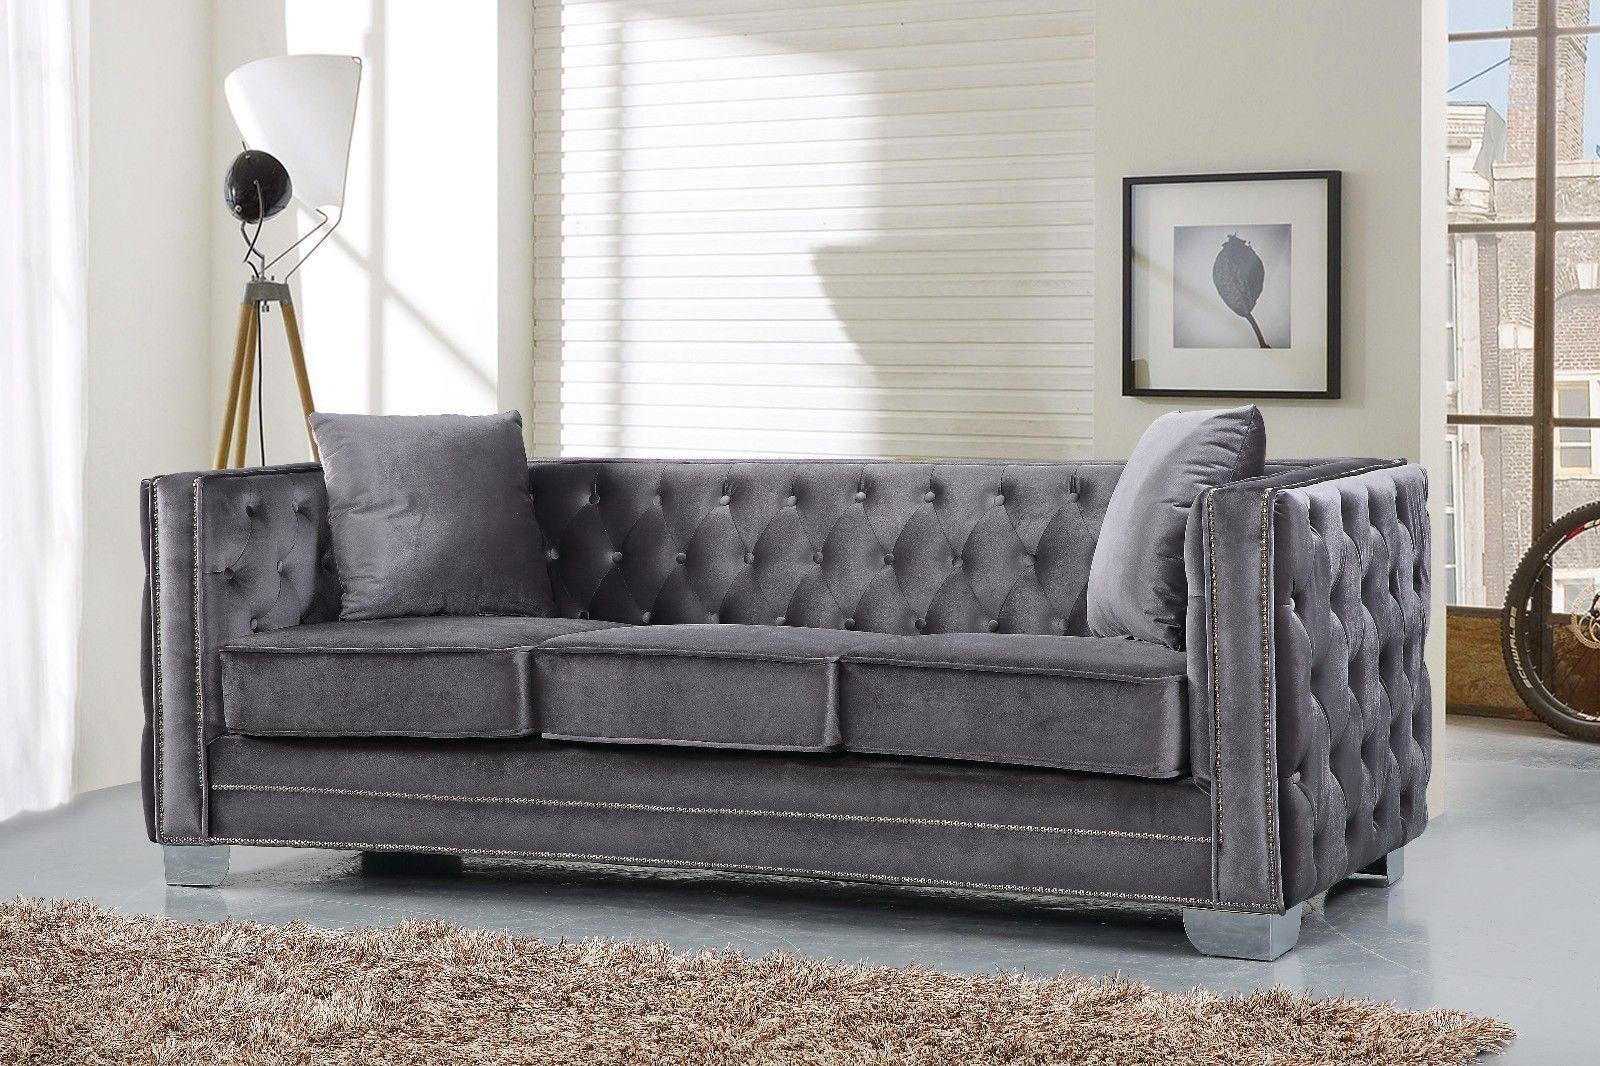 Meridian 648 Velvet Living Room Sofa Set 2pc. Tufted Grey Contemporary Style